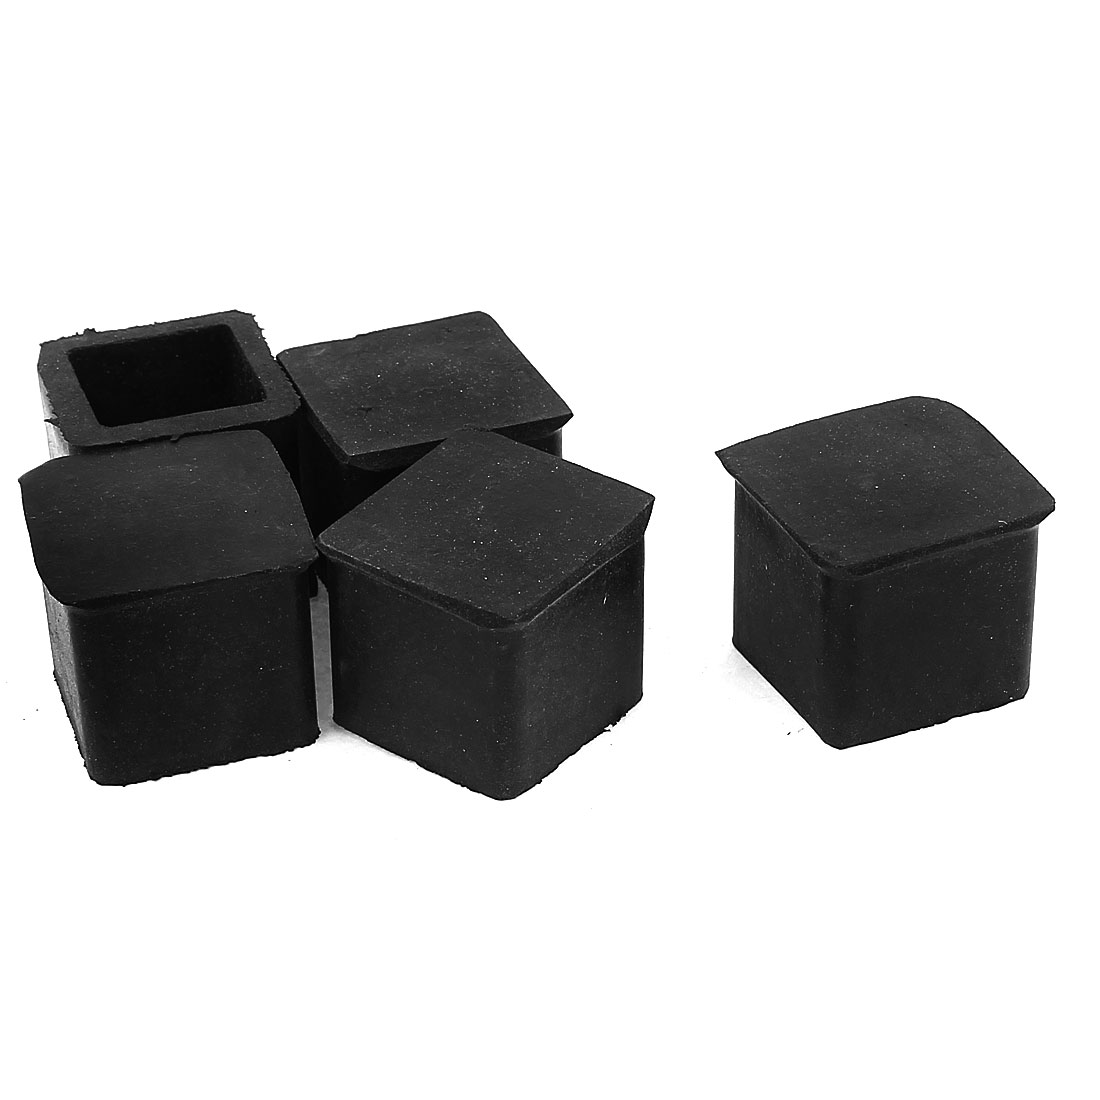 Rubber Furniture Leg Chair Feet Protection Pad 20mmx20mm 5Pcs Black